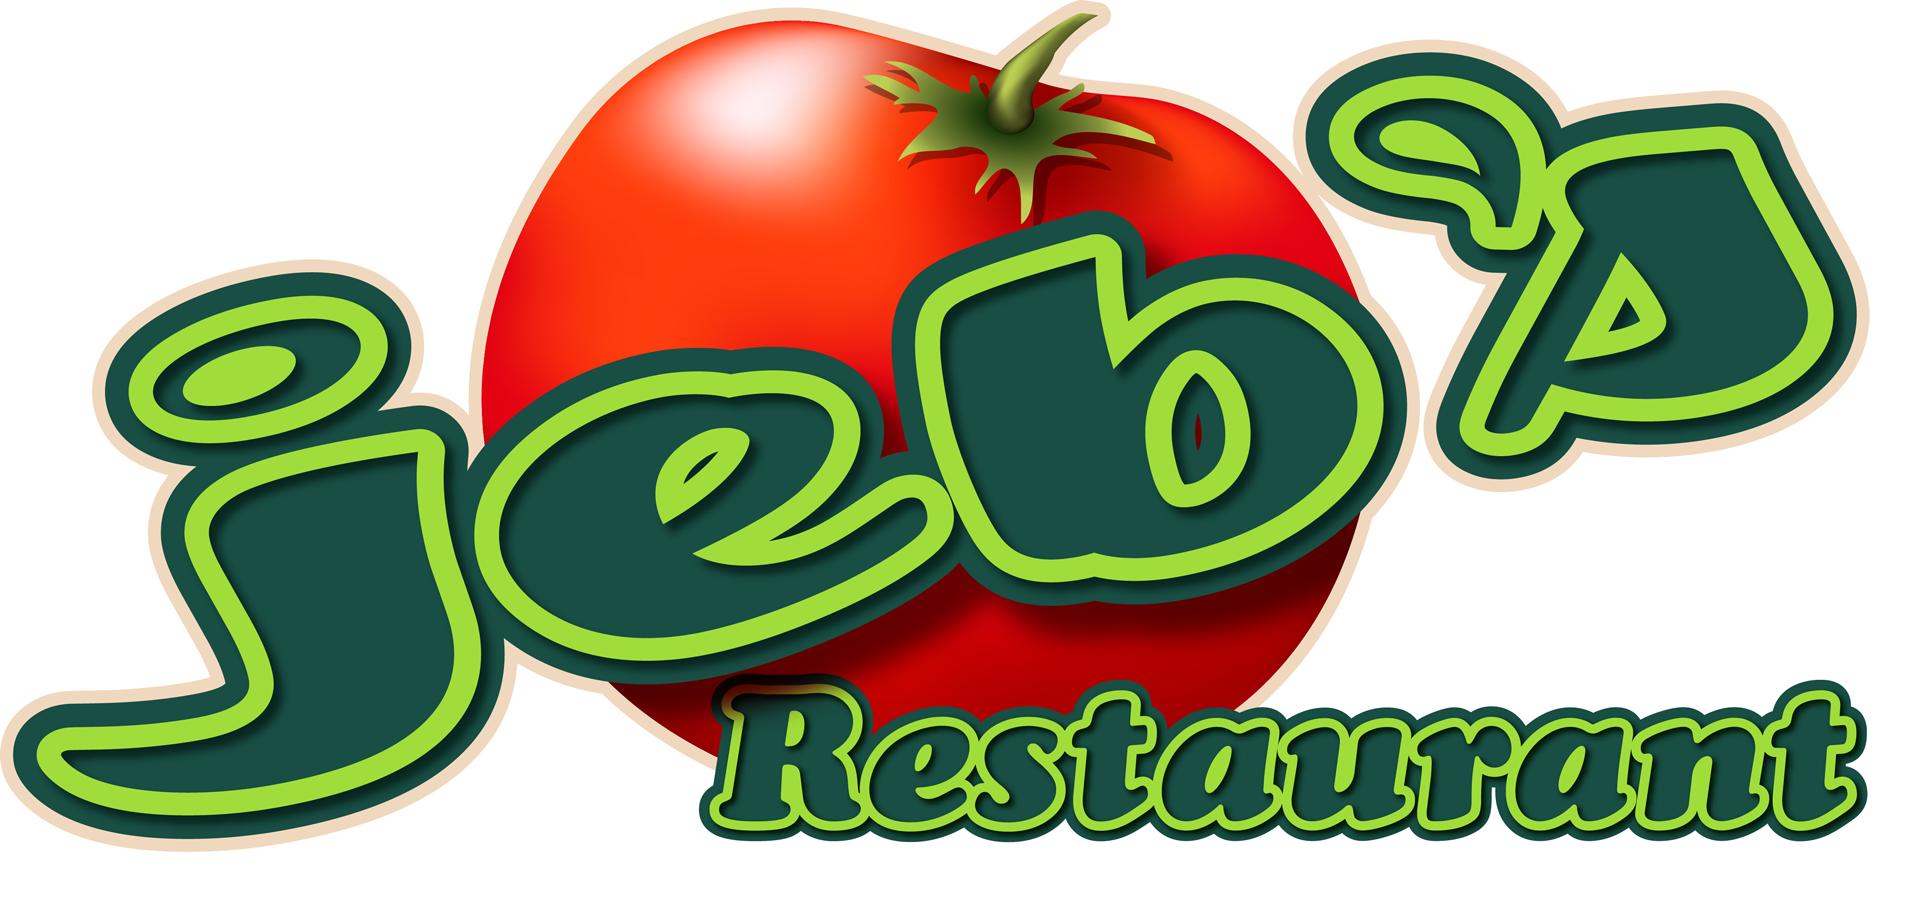 Jebs sports club lowville. Restaurants clipart restaurant menu